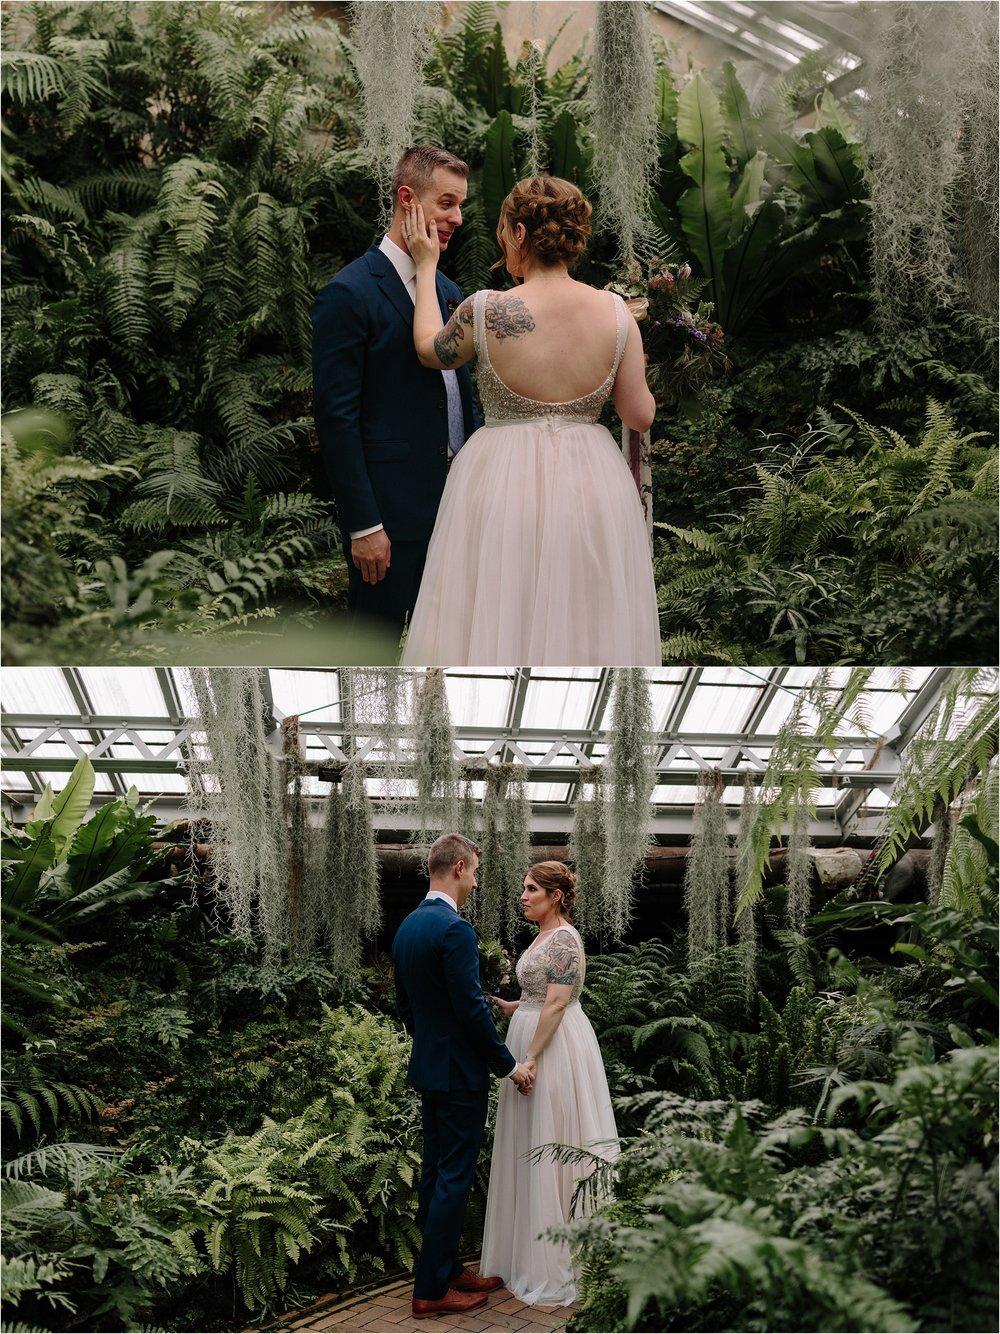 garfield-park-conservatory-wedding-90.jpg